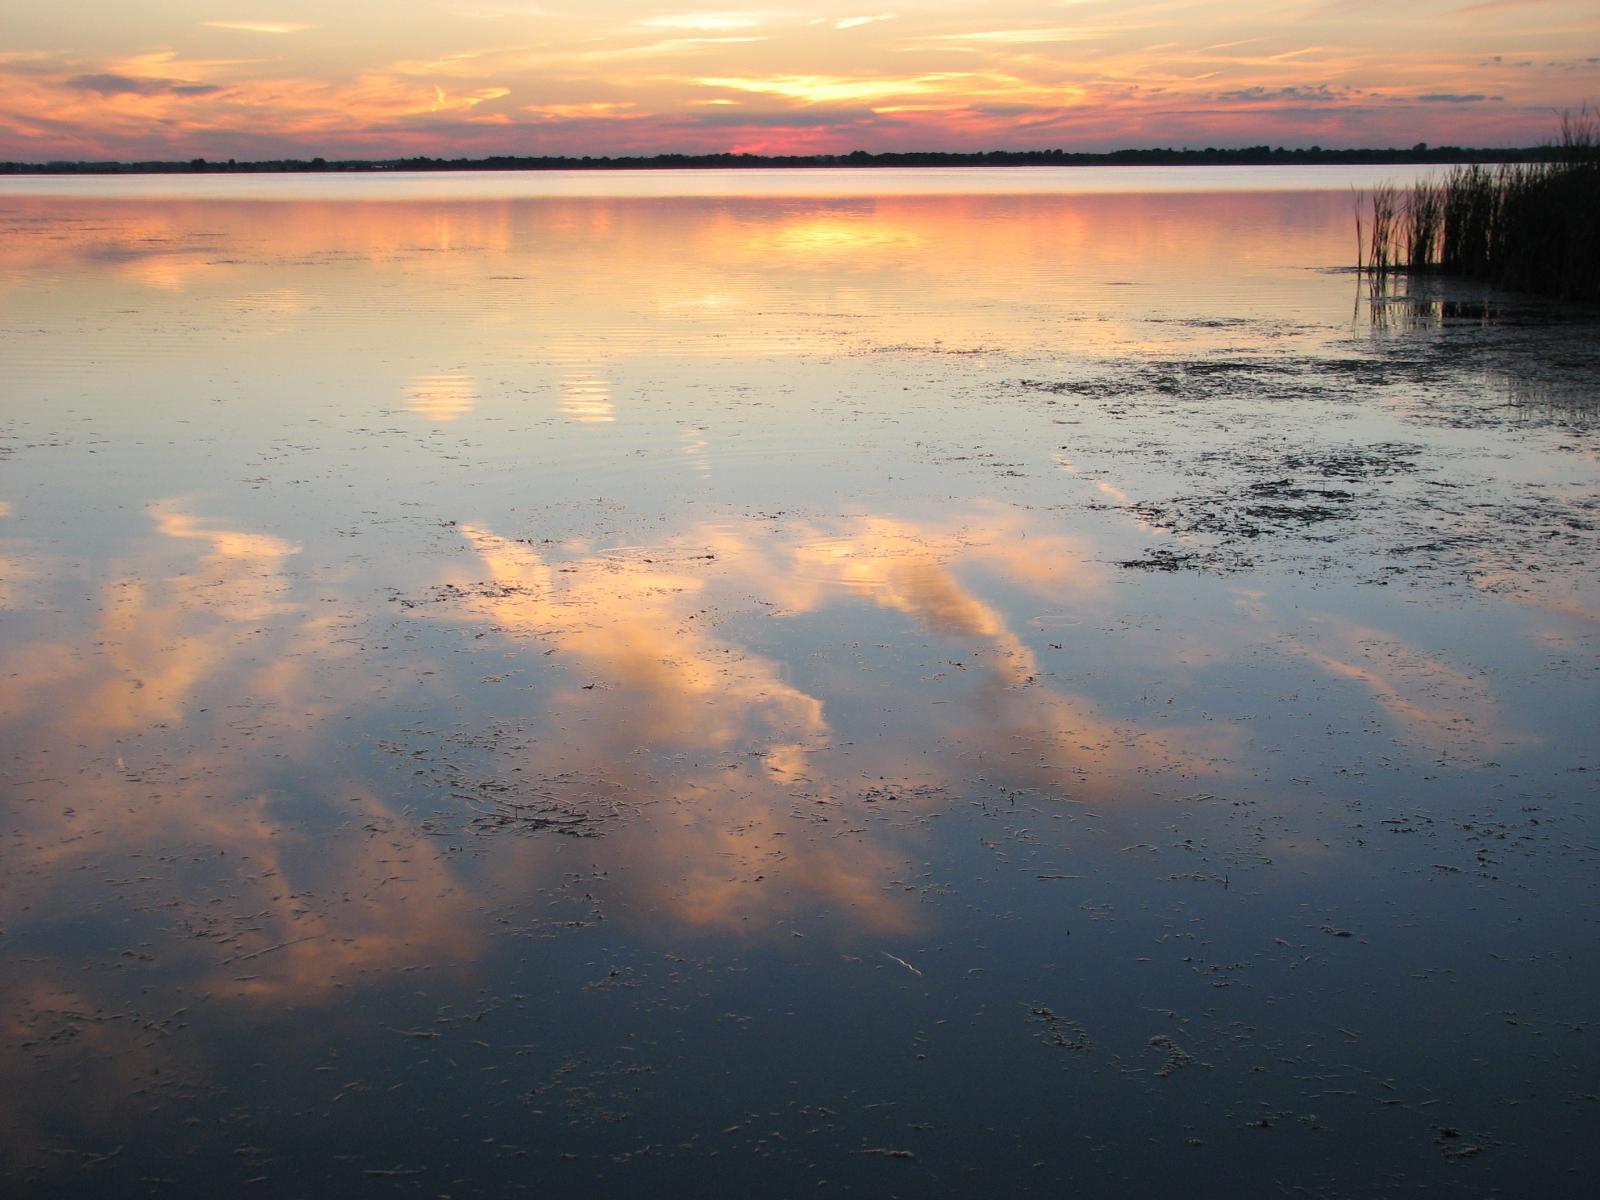 sunset marsh  -Ric McArthur